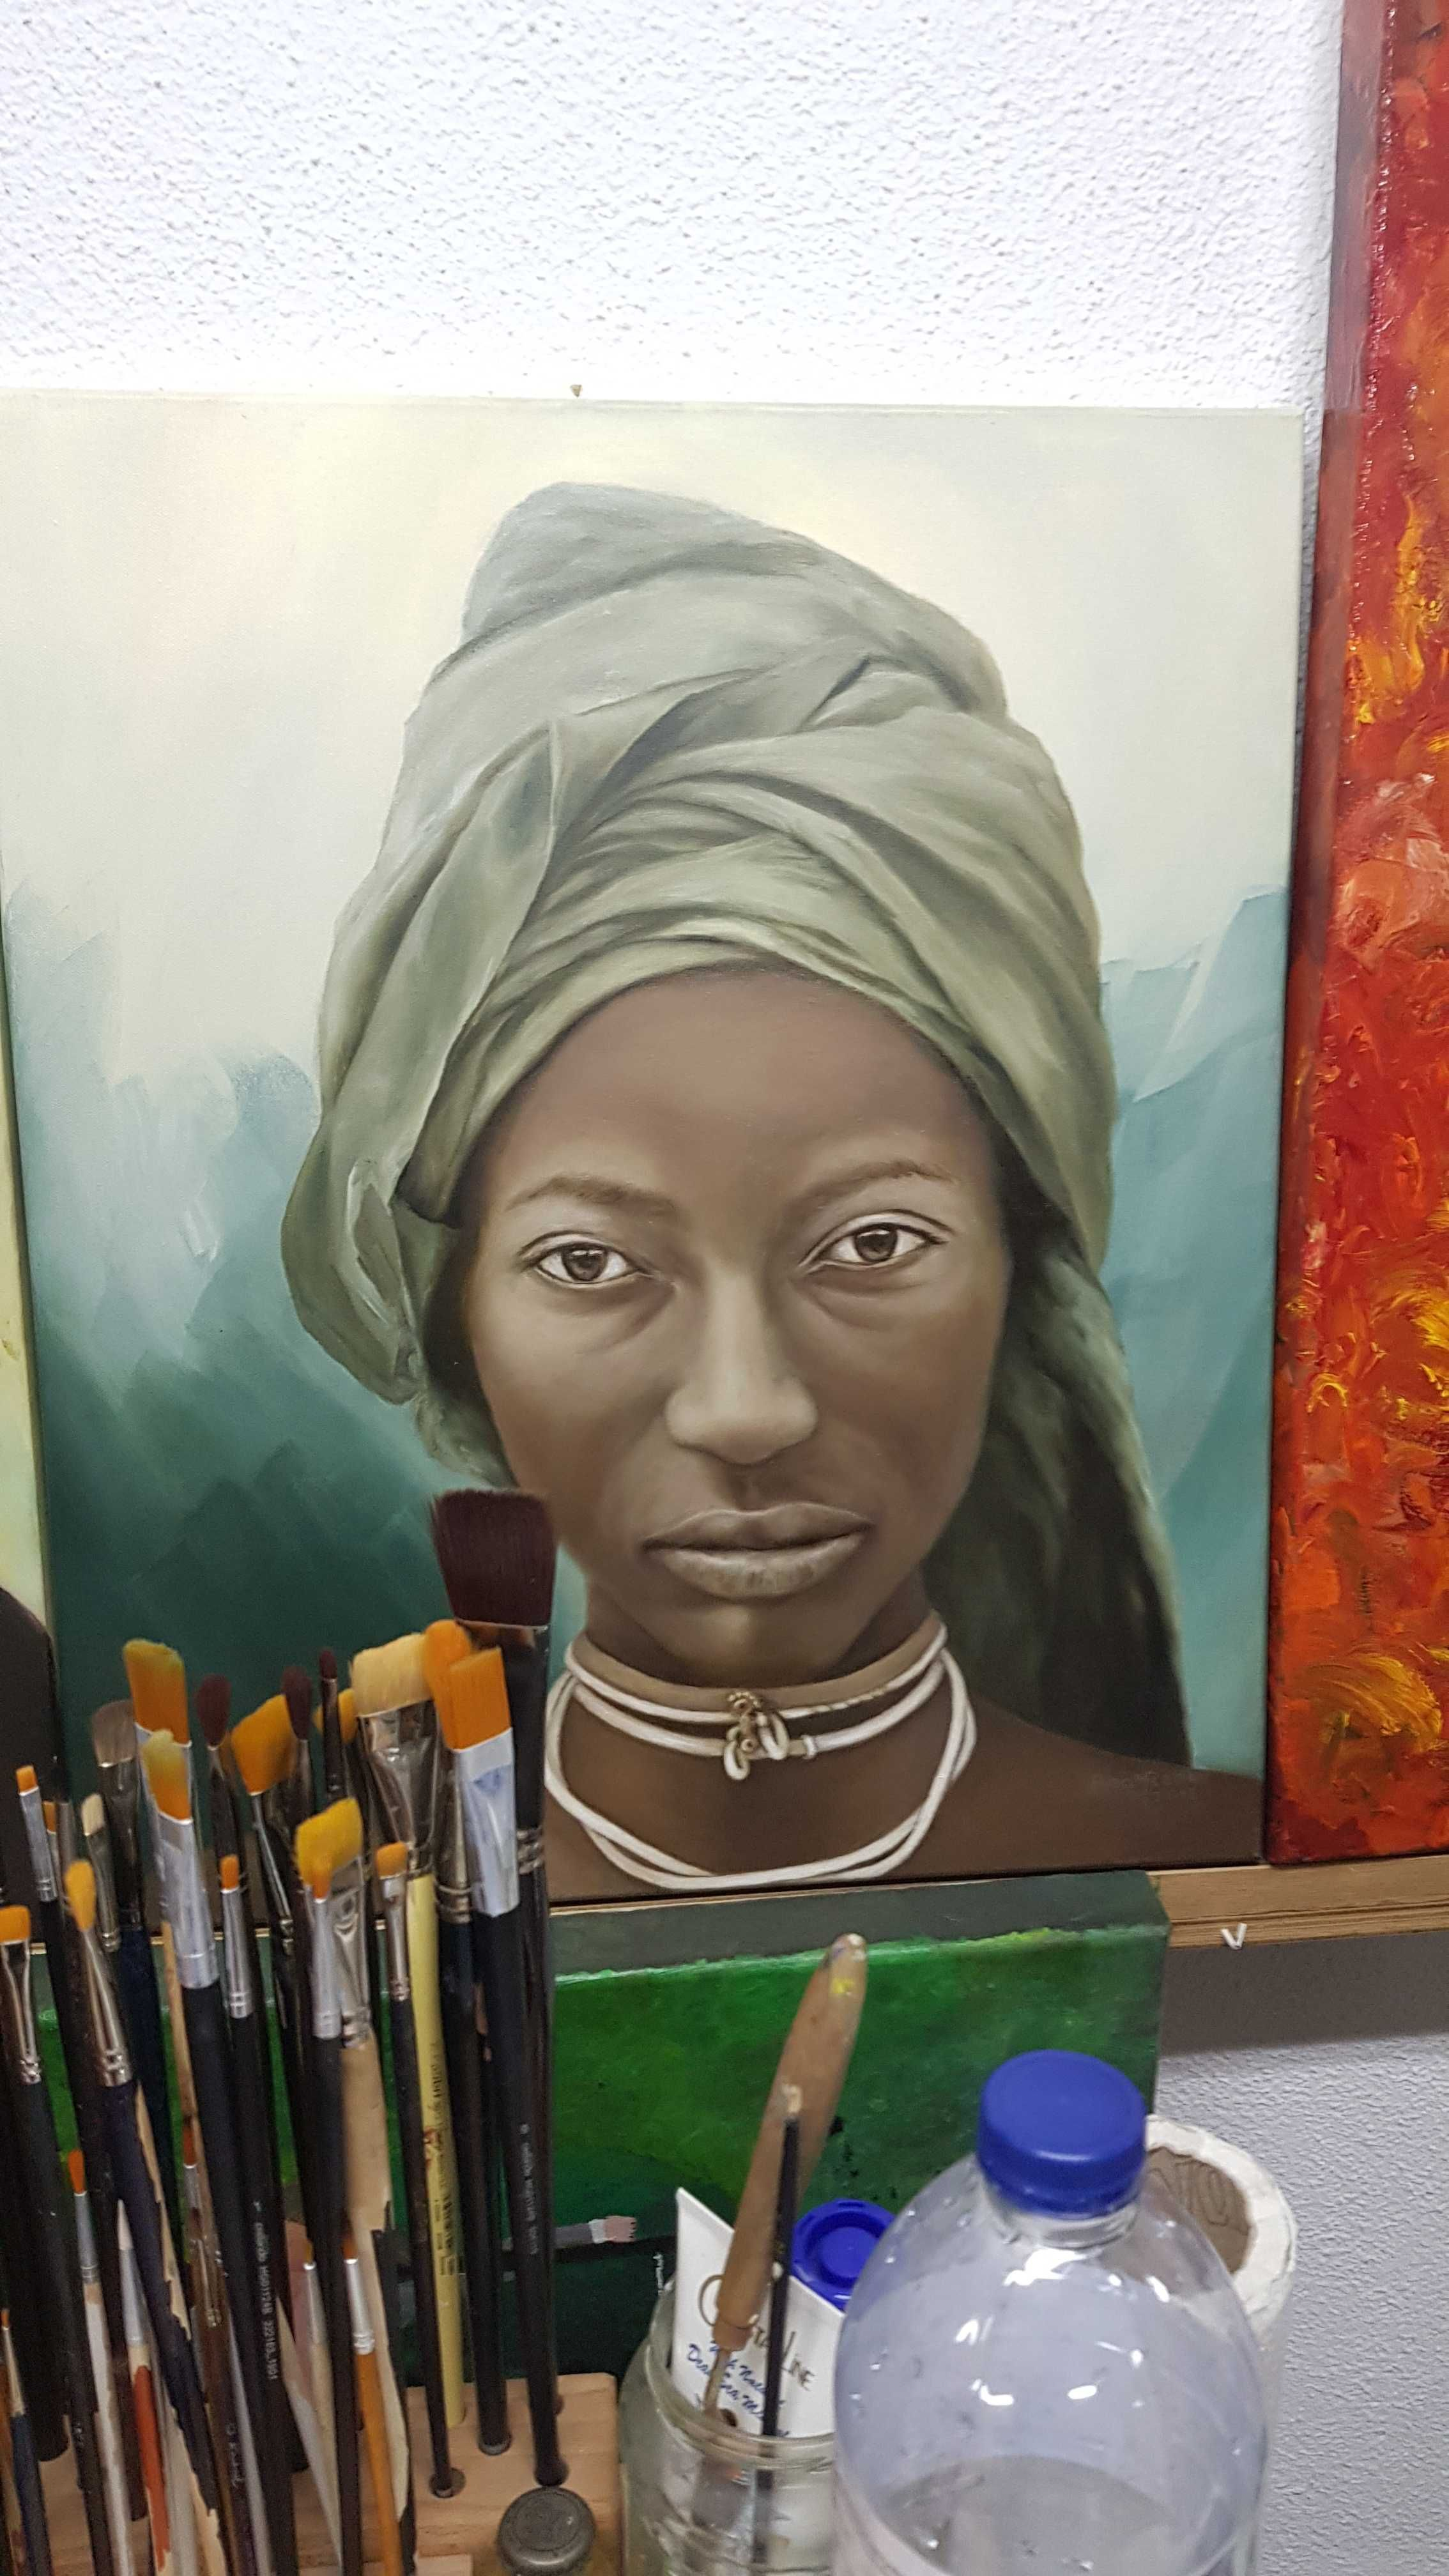 Pintura hiper realista